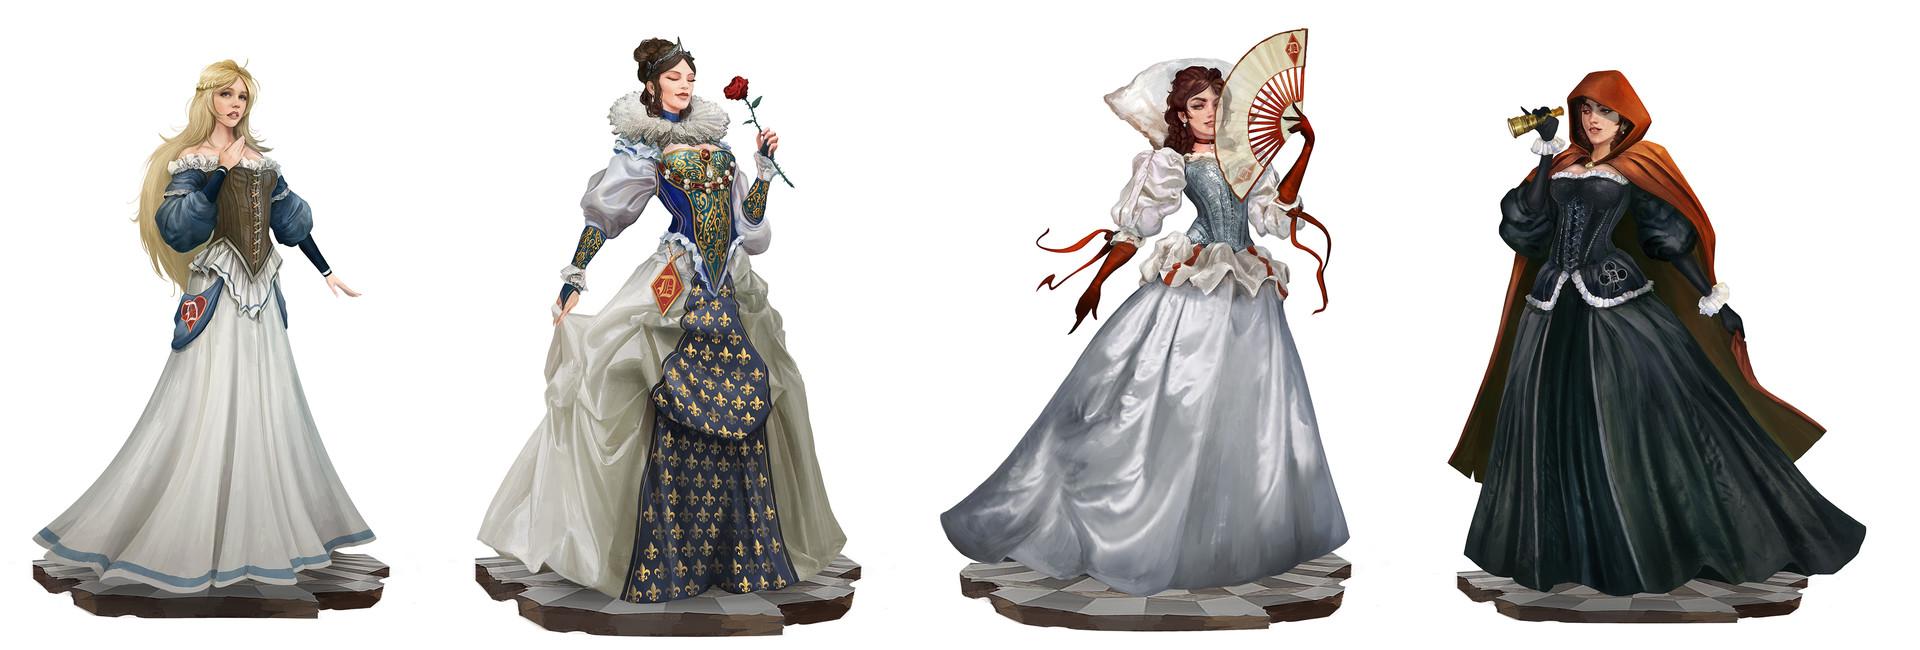 Alexandre chaudret nola characters folio lineup woman